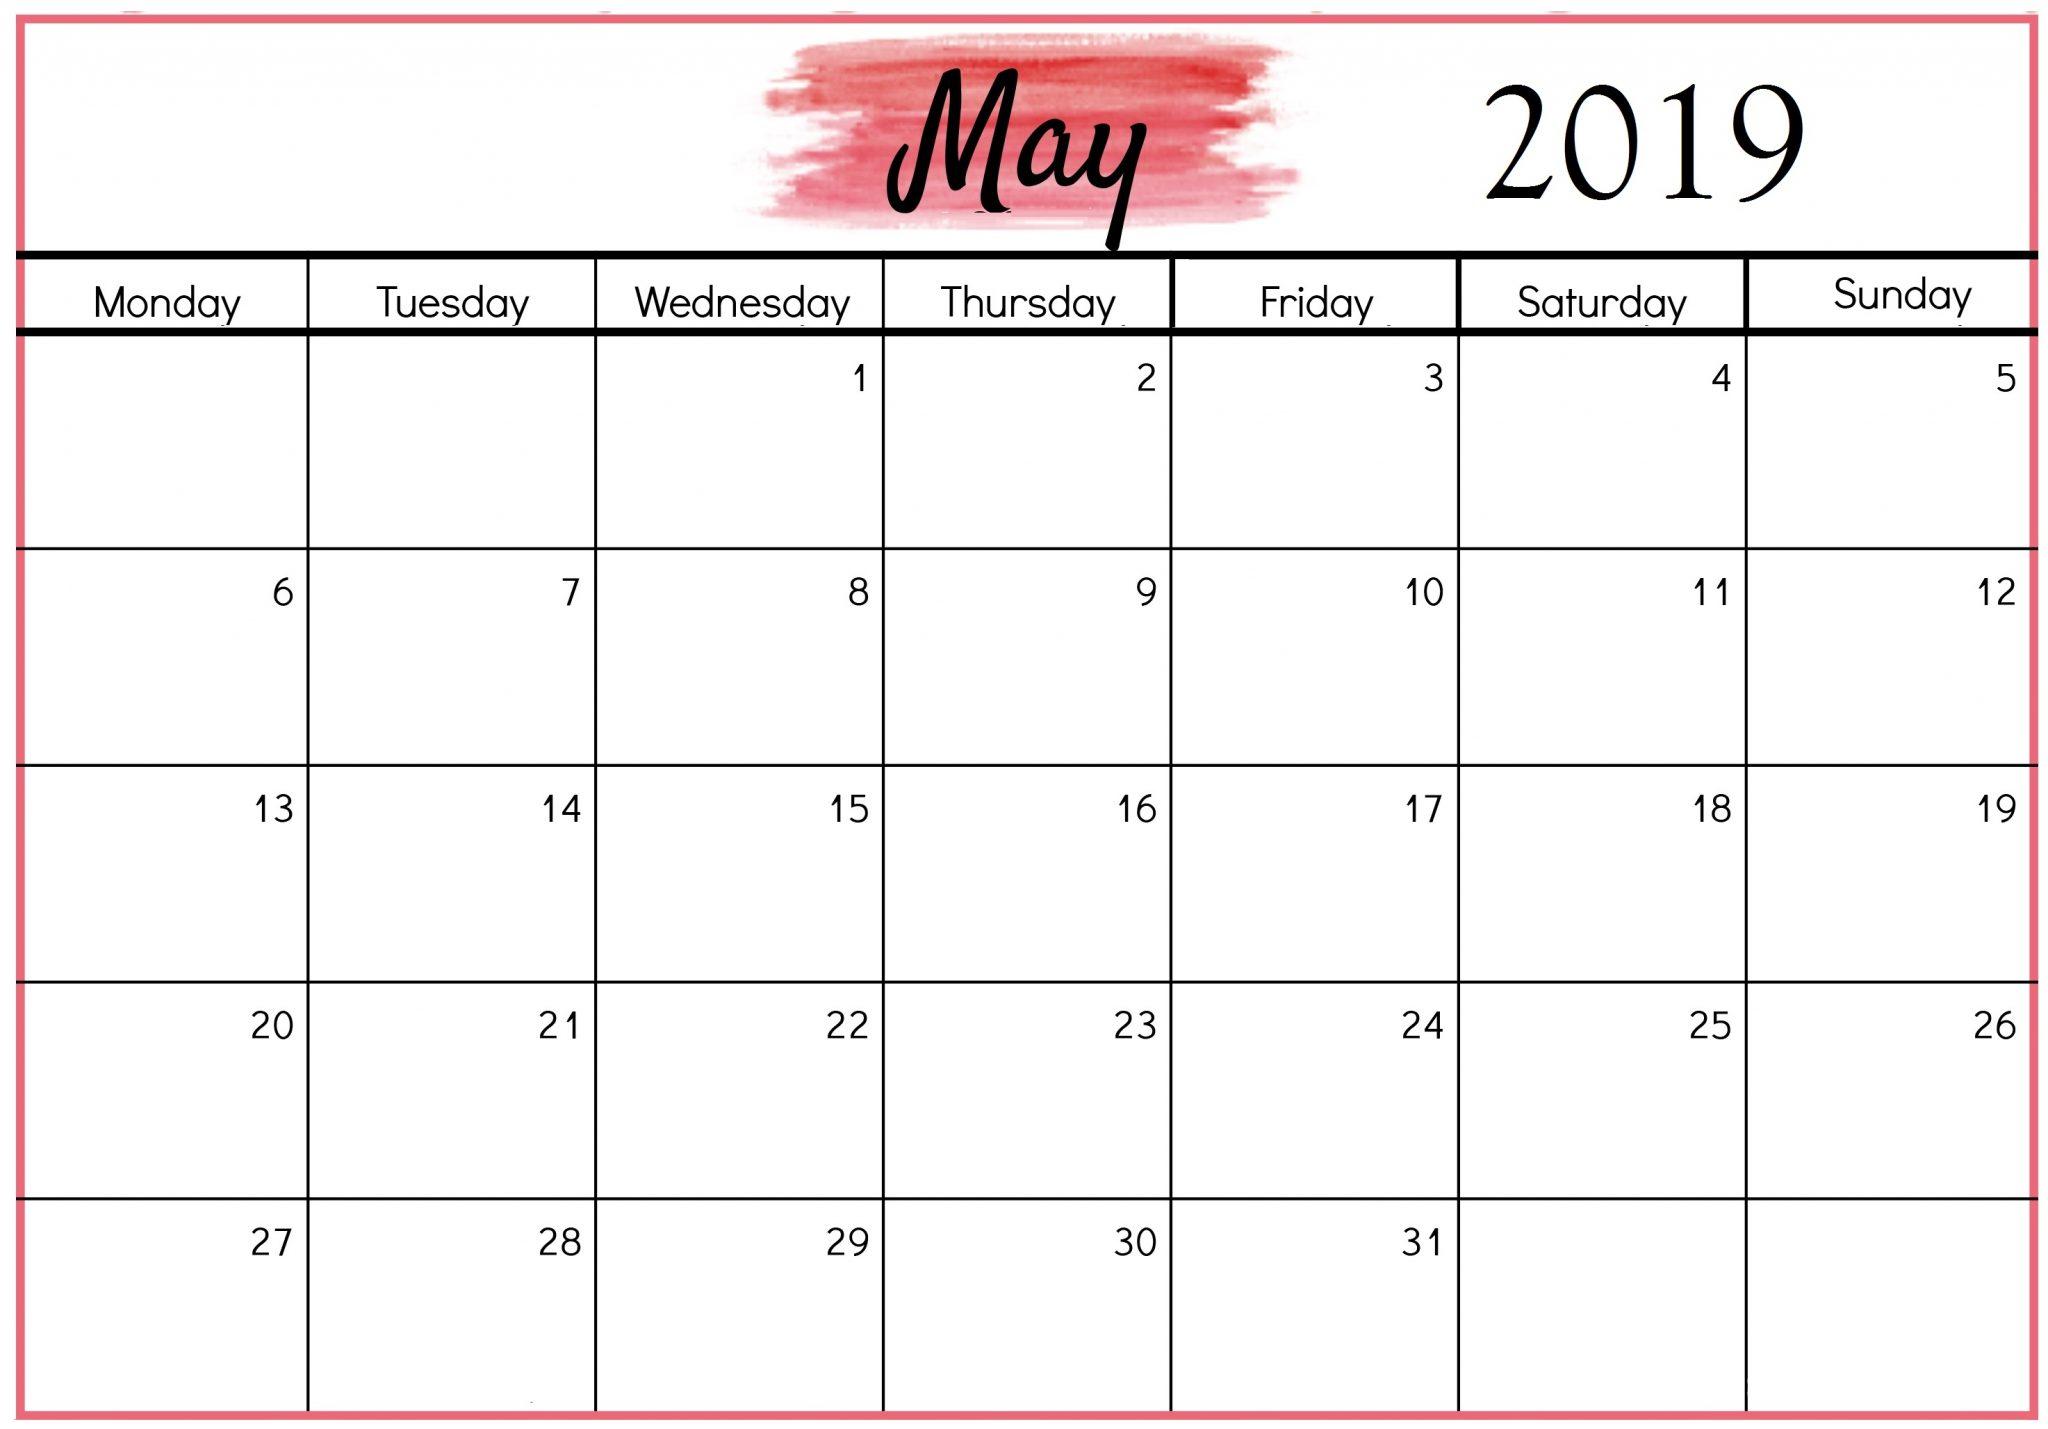 Editable May 2019 Calendar In Pdf, Word, Excel Printable Template